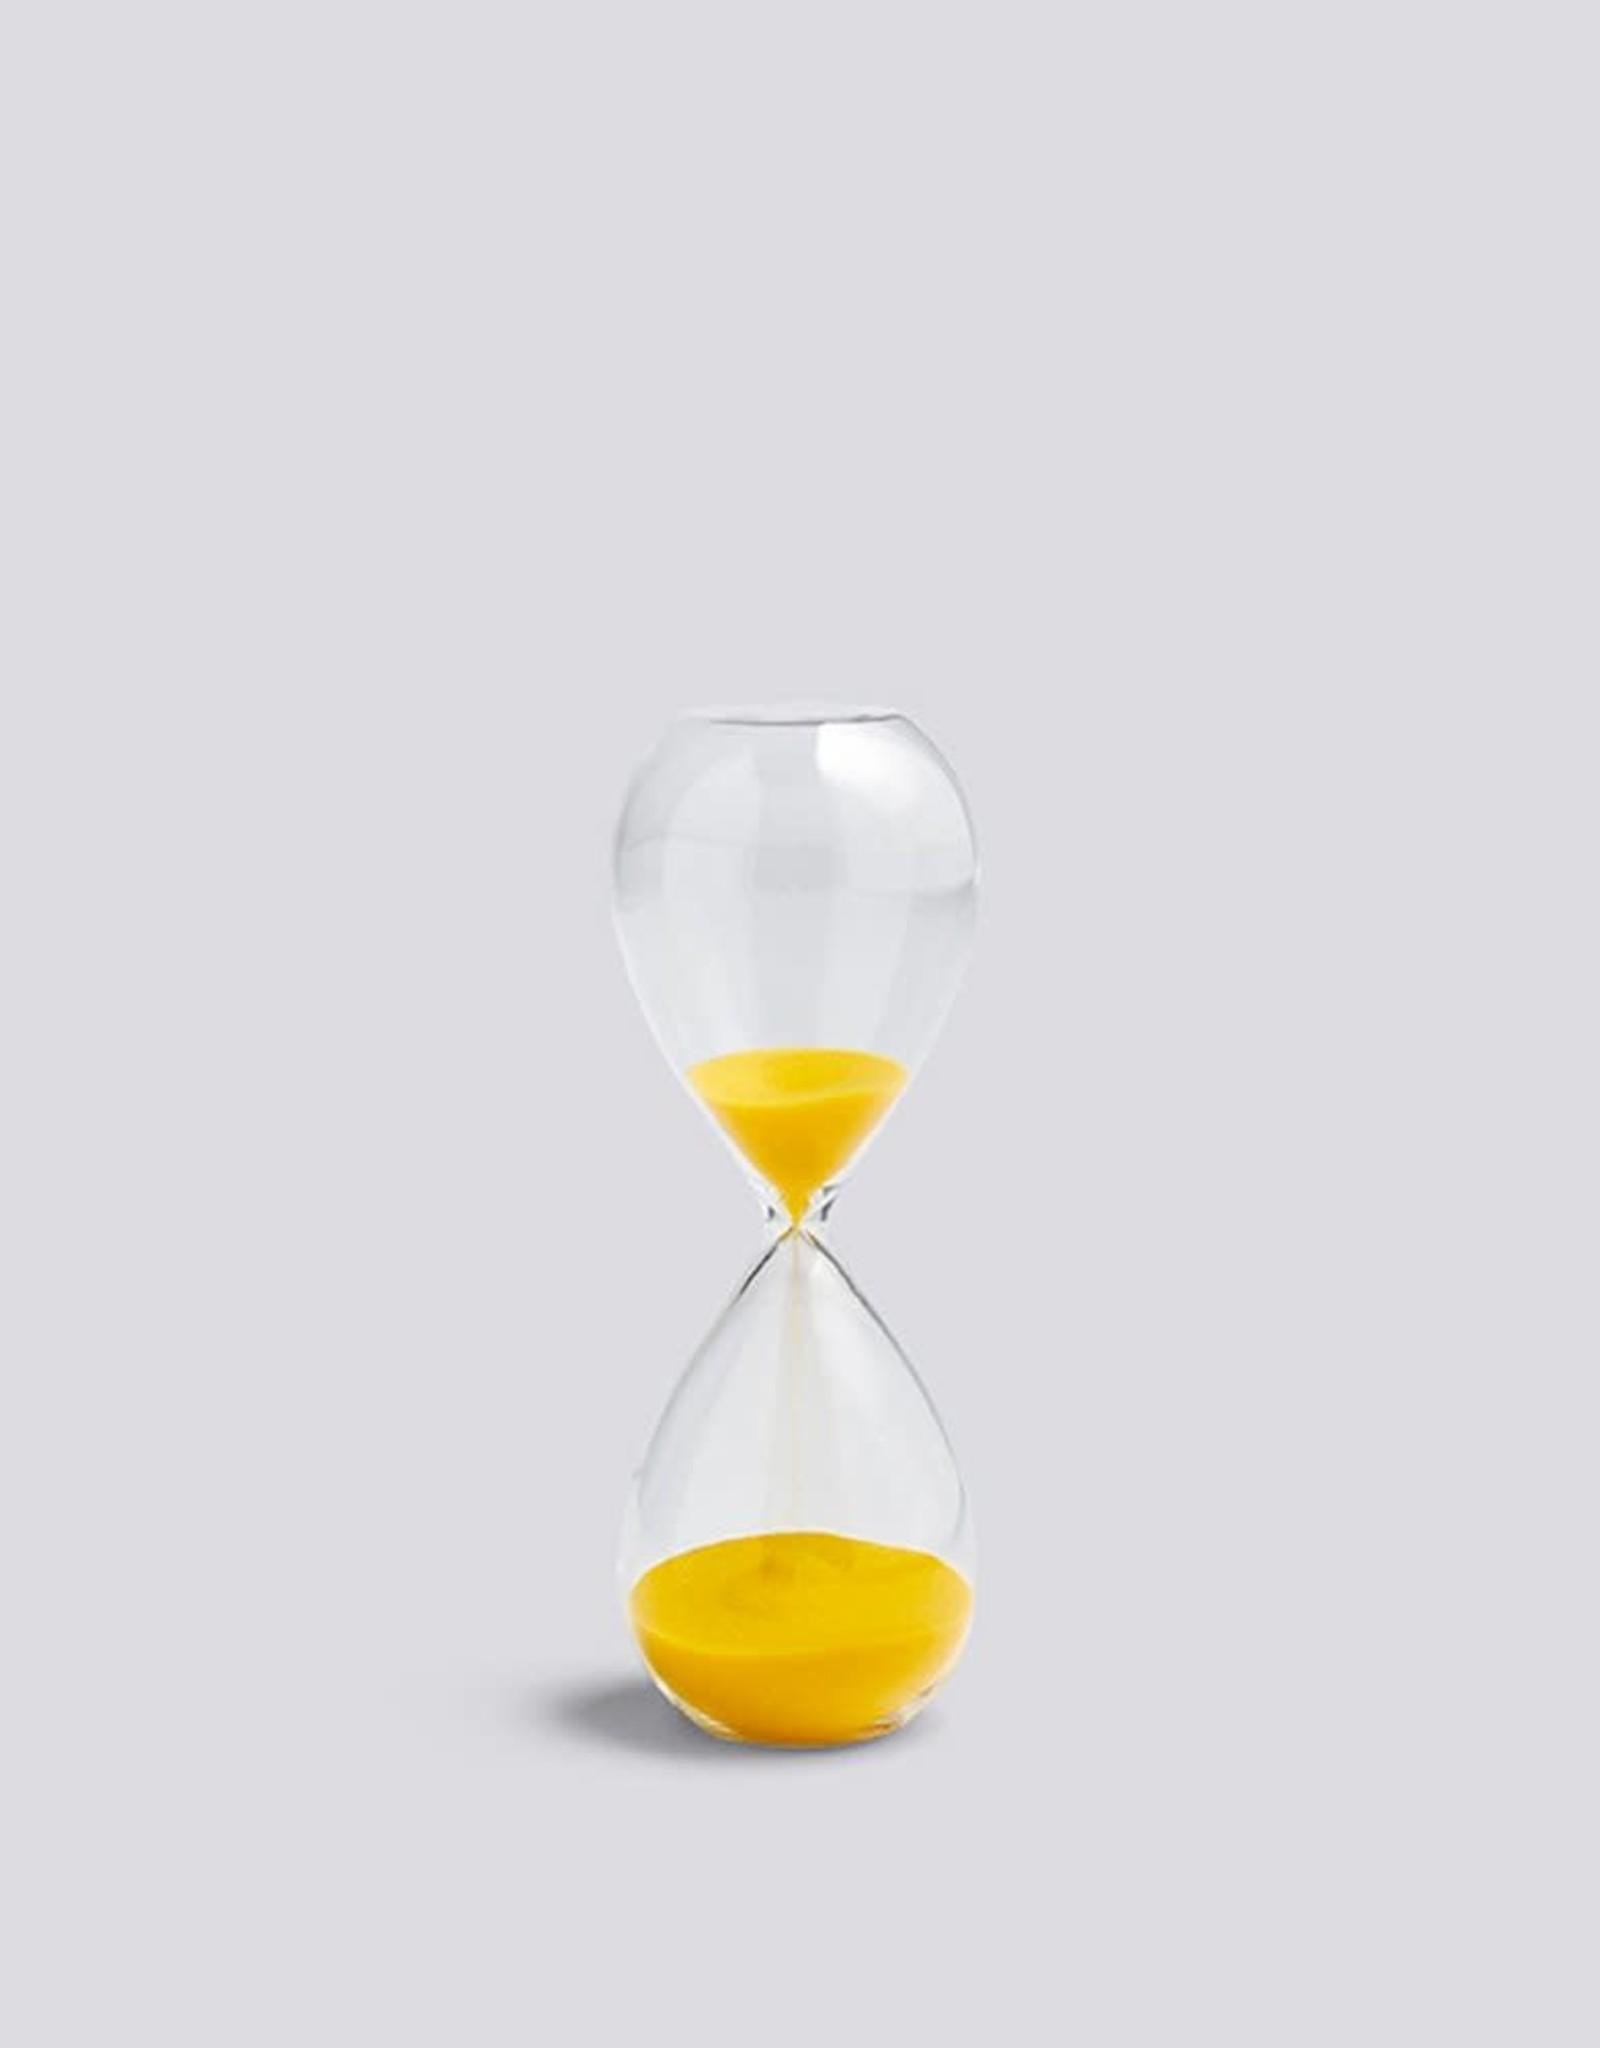 Hay Sablier Time 15 min M Lemon yellow